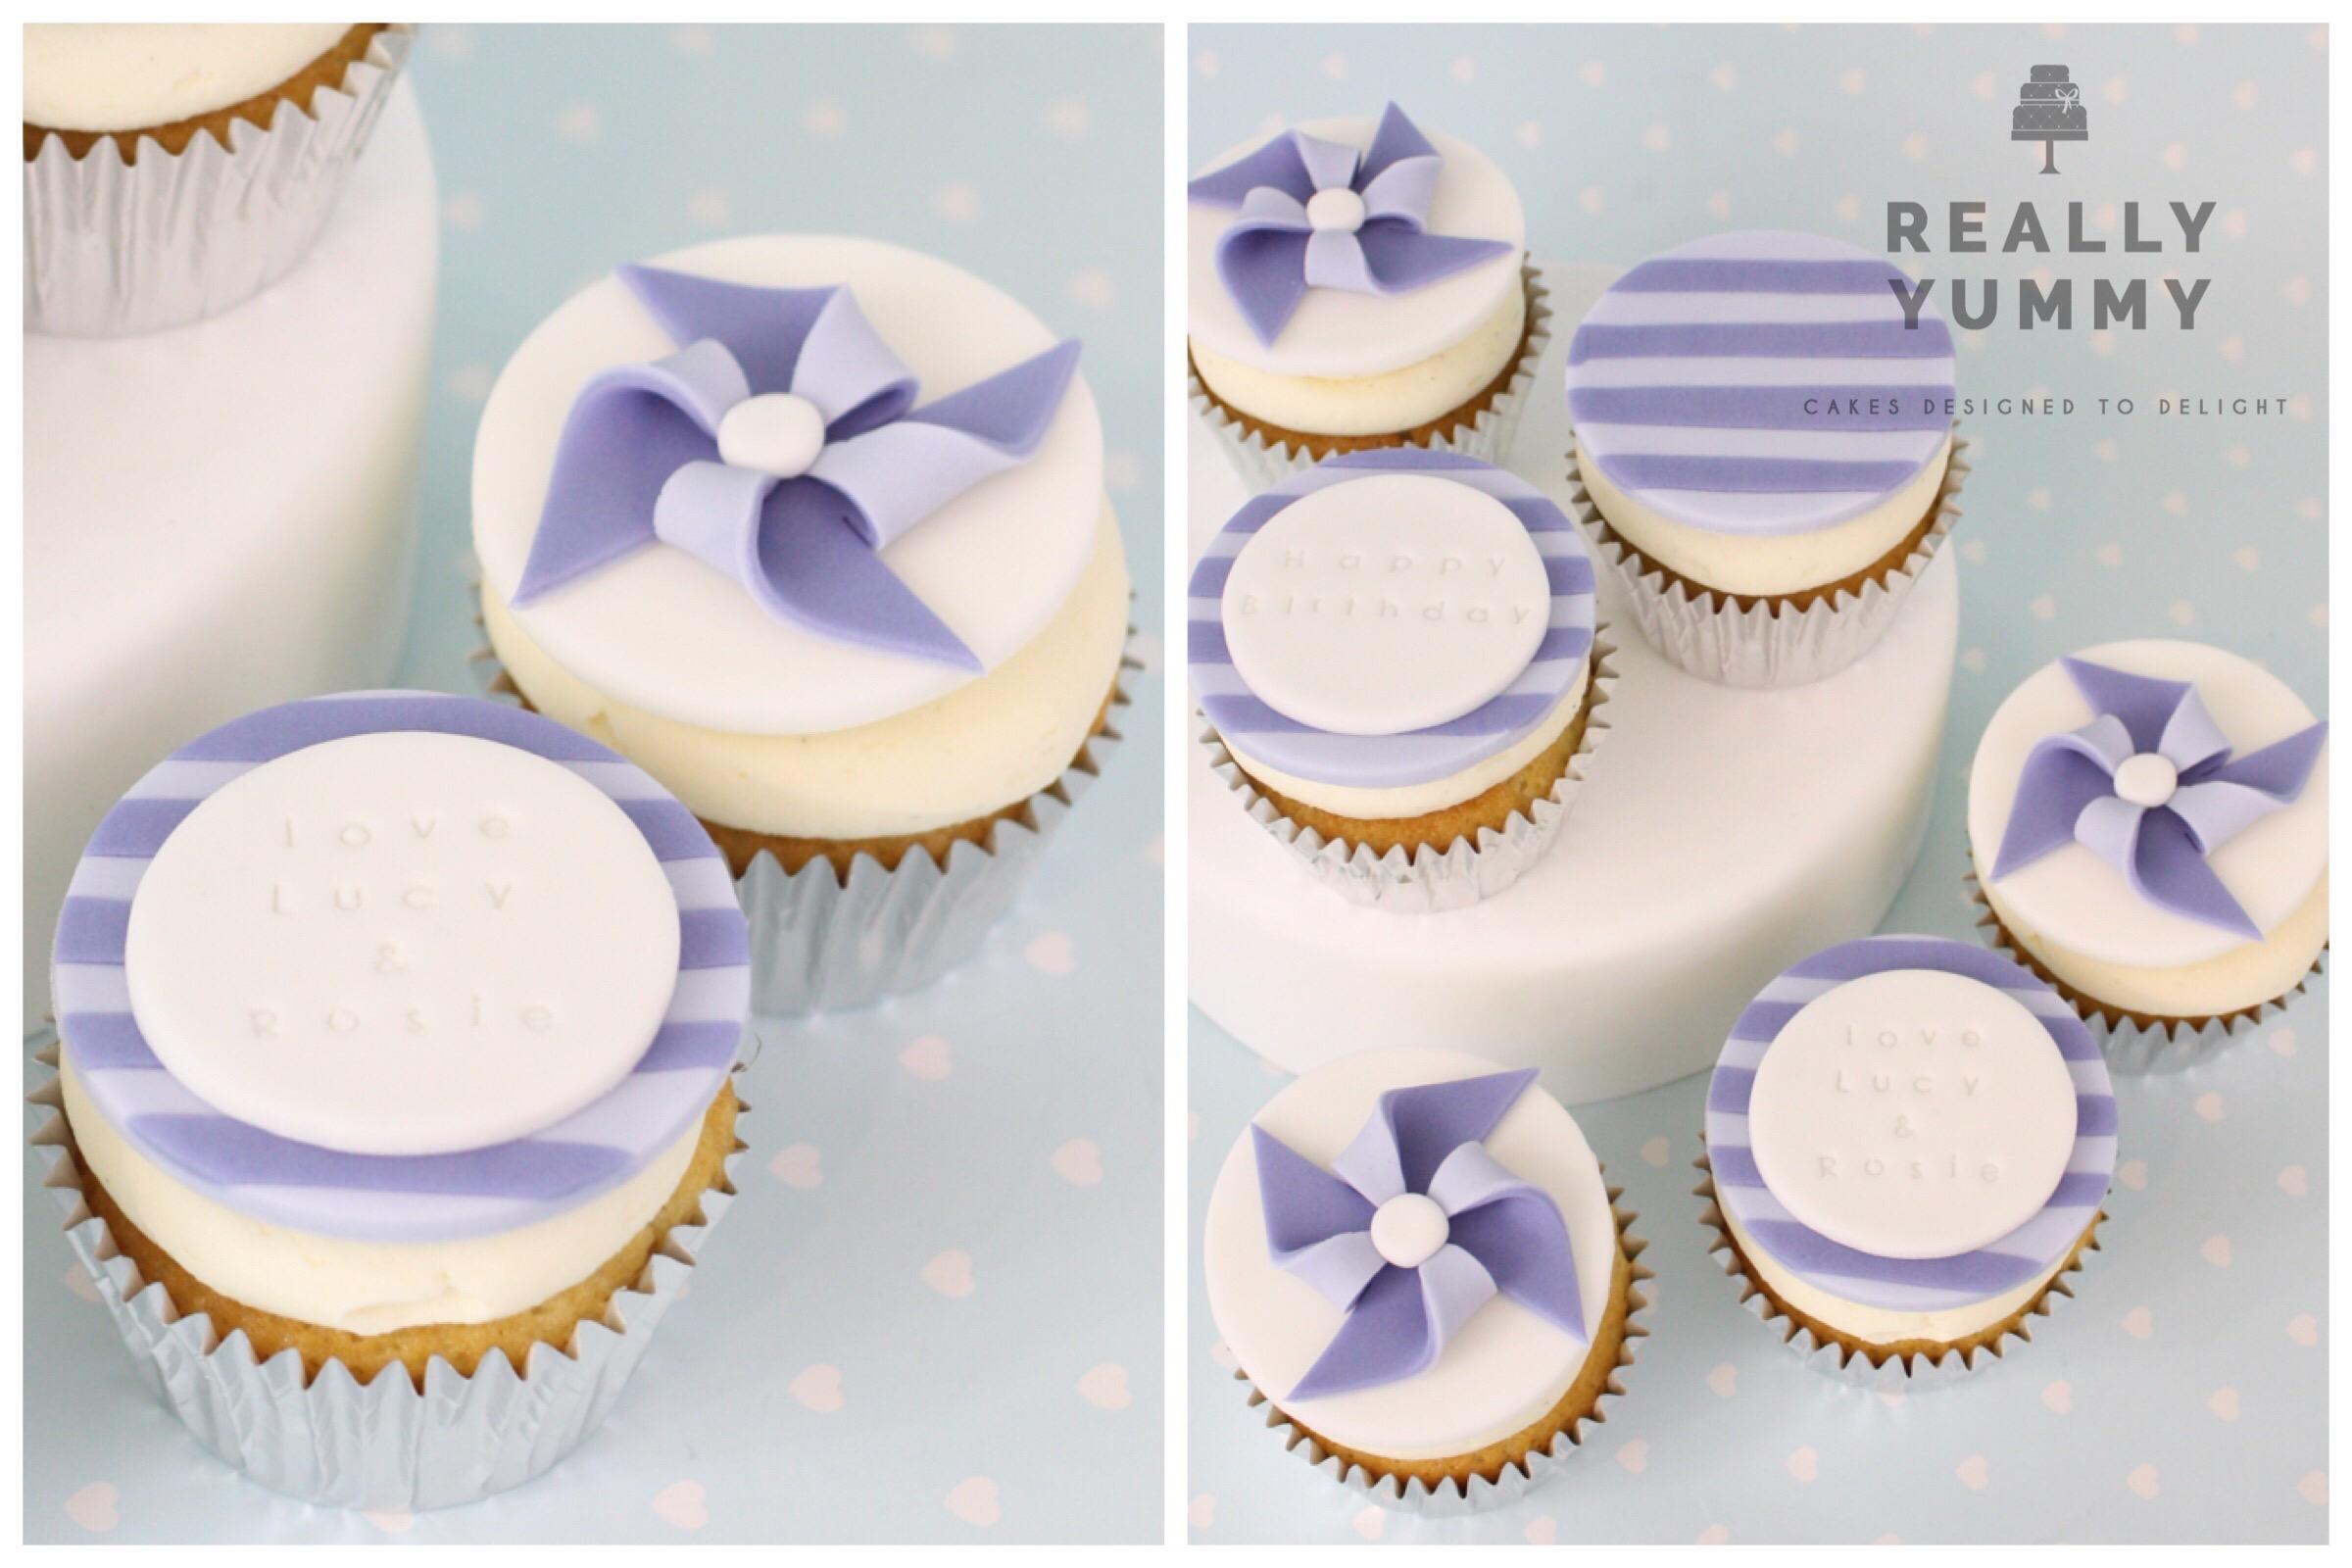 Pinwheel cupcakes in purple